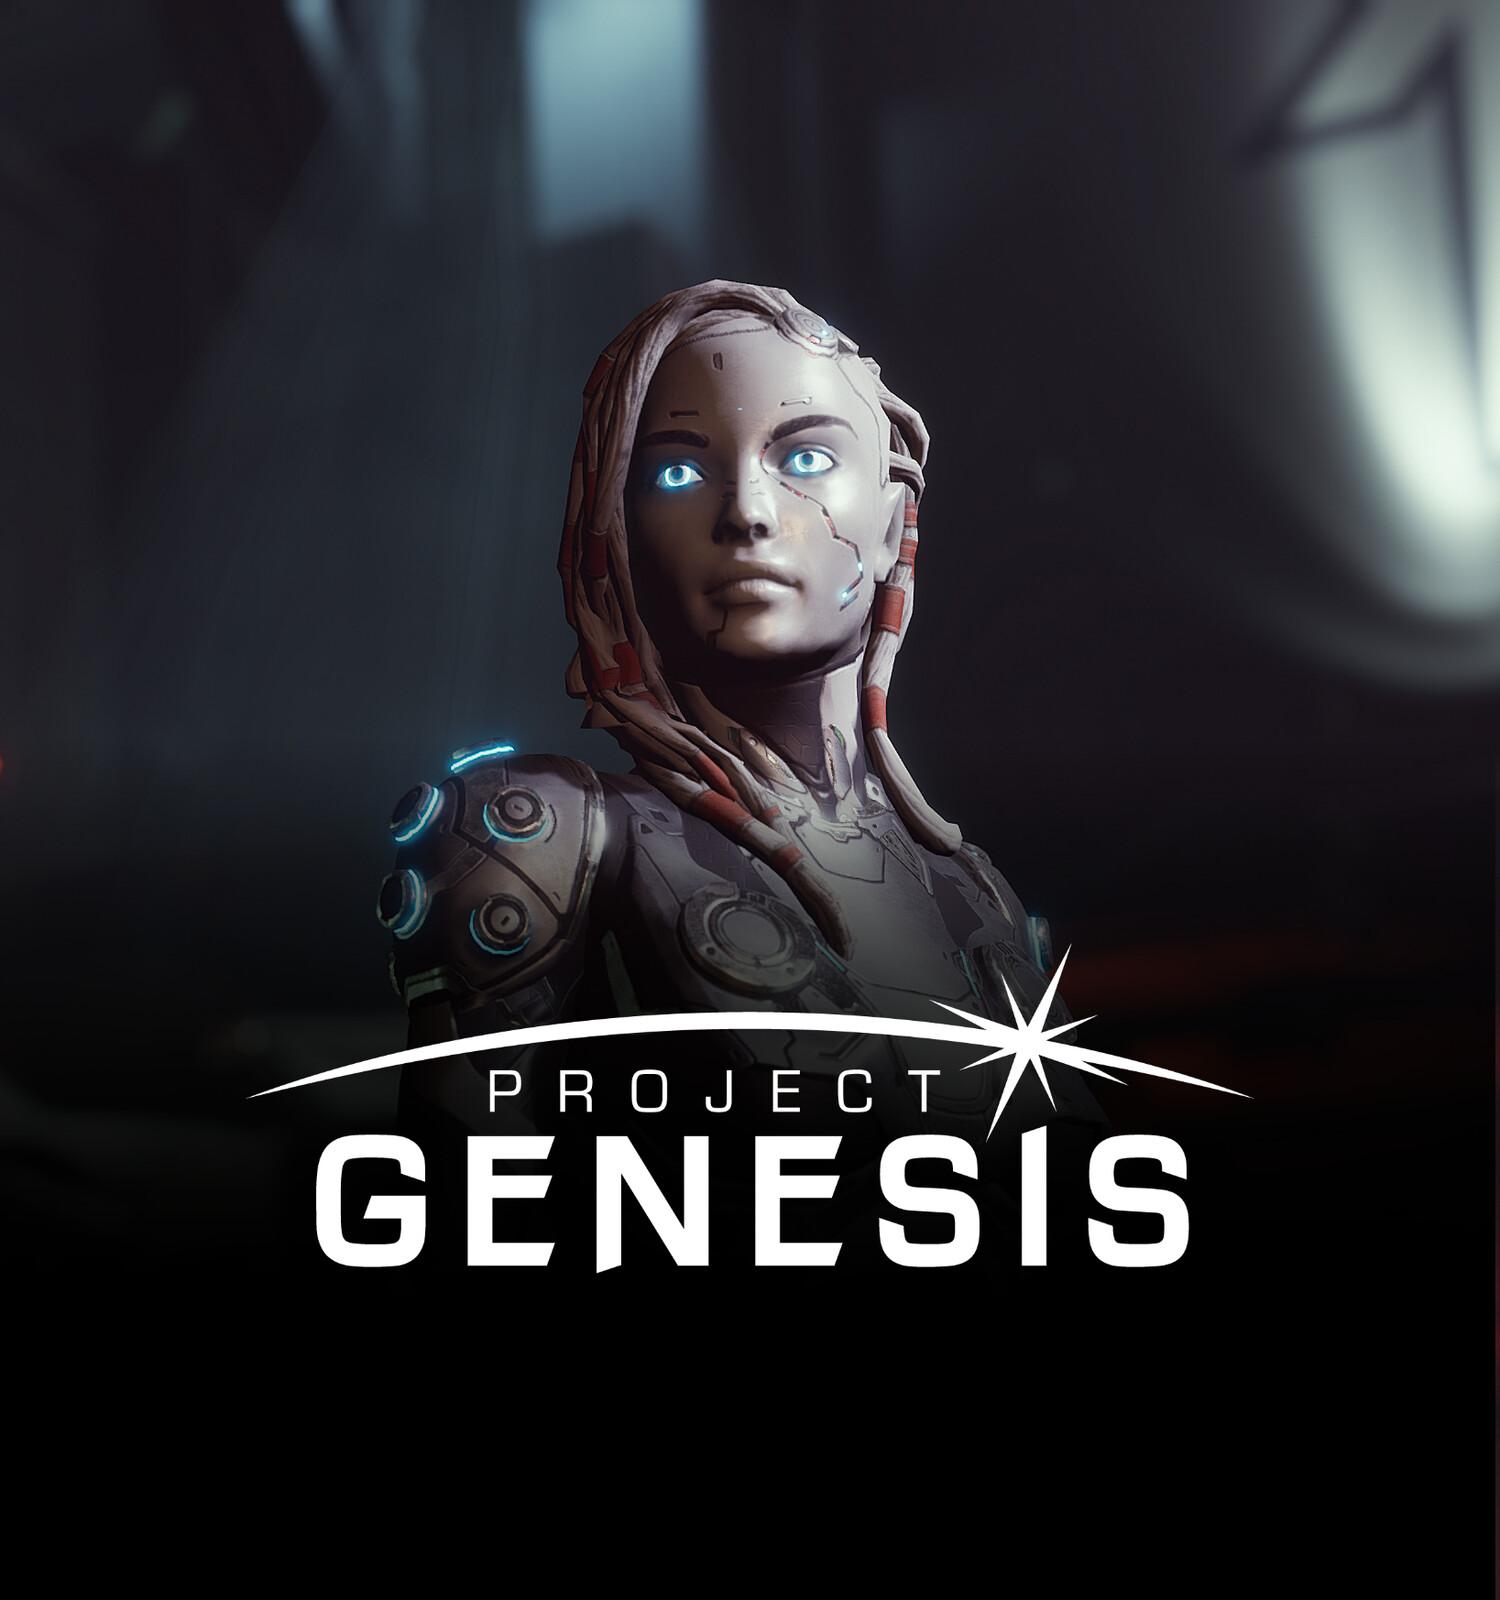 [UI Design] Project Genesis - Menu Design Concept